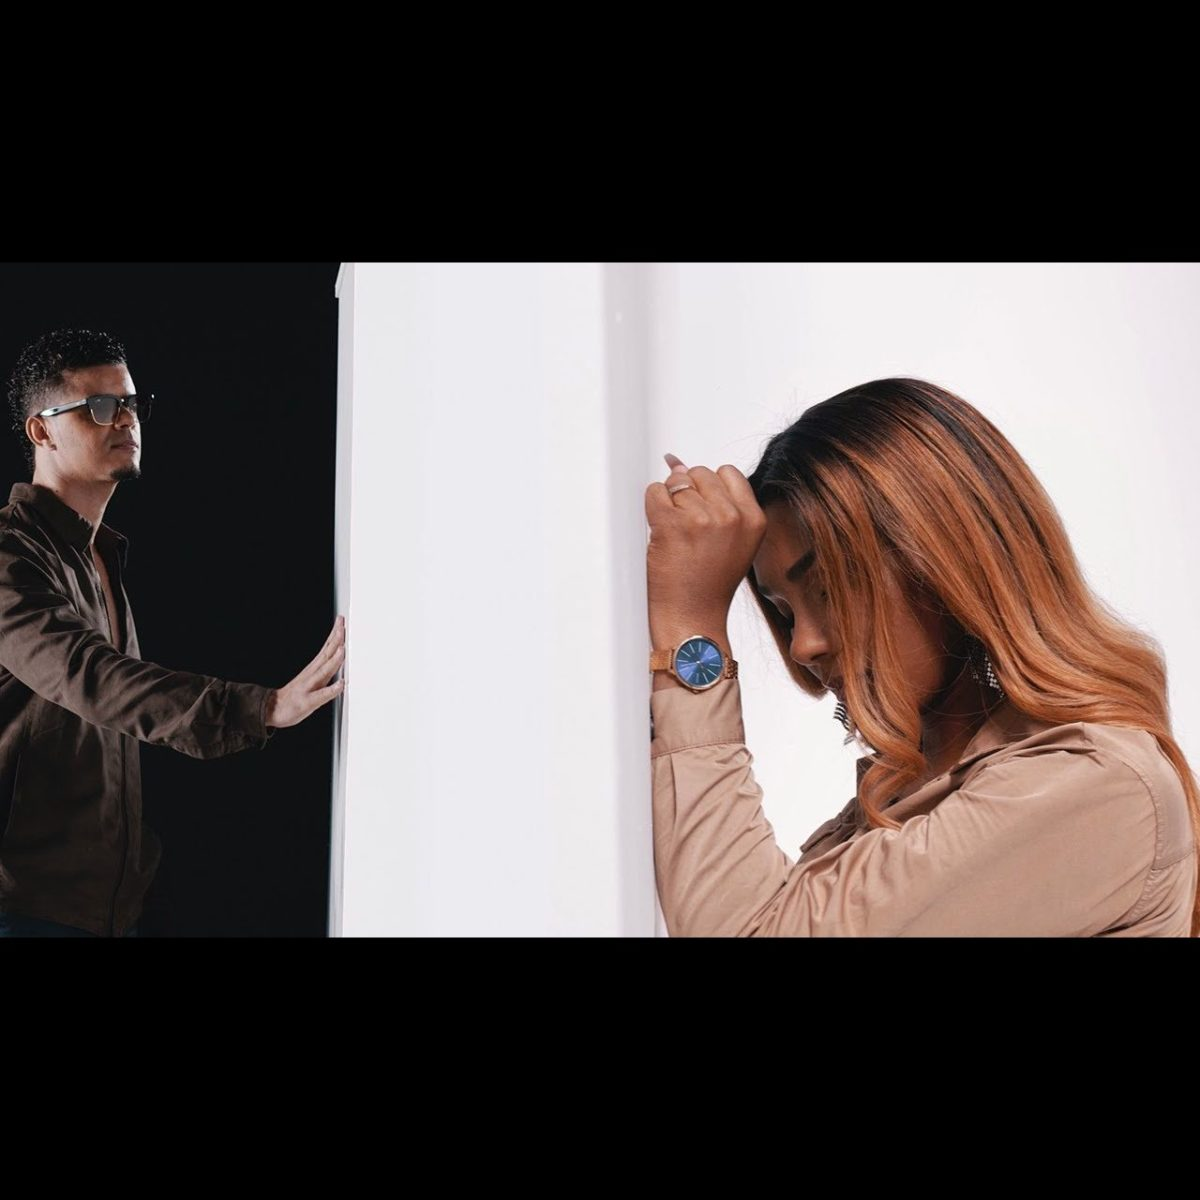 Denis Graça - Até fim (ft Irina Barros) (Thumbnail)